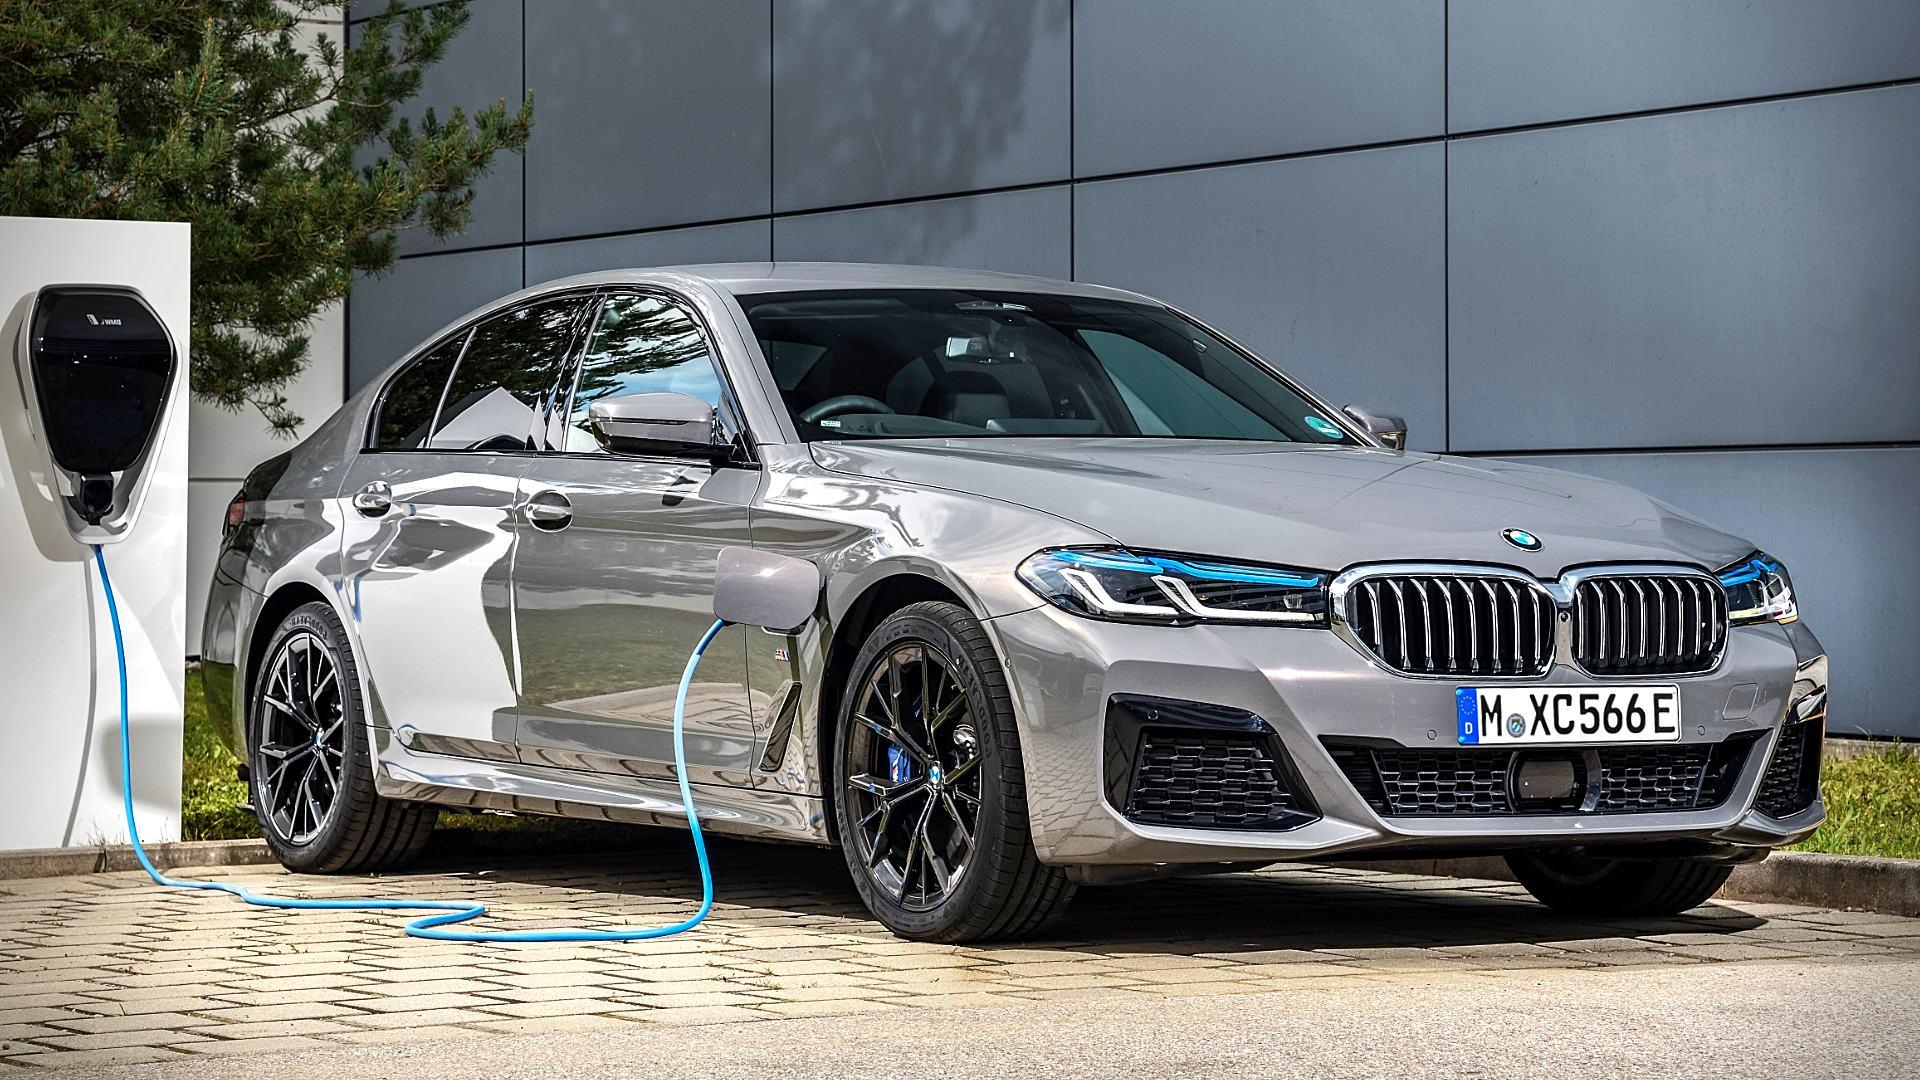 2021 BMW 545e xDrive Hybrid Cars